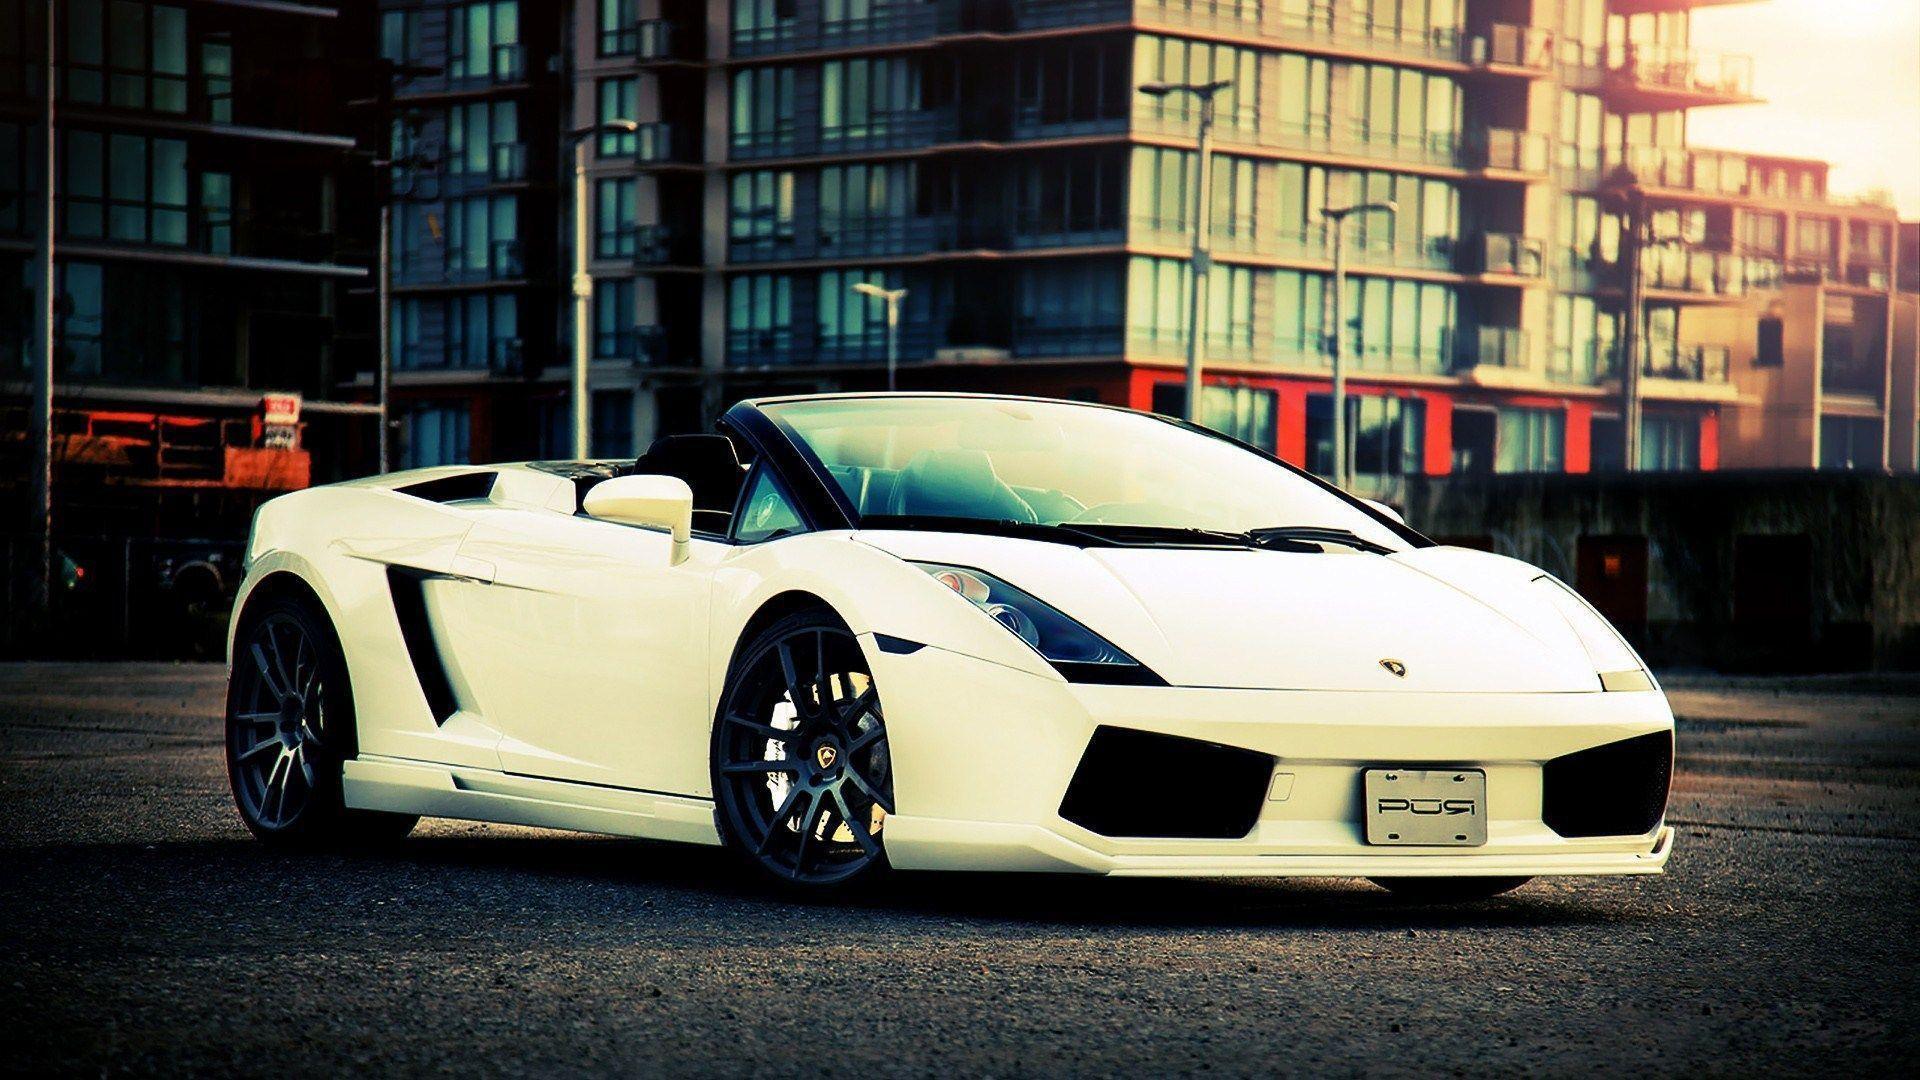 Background Car Hd Wallpapers Cities: Lamborghini Gallardo Wallpapers HD